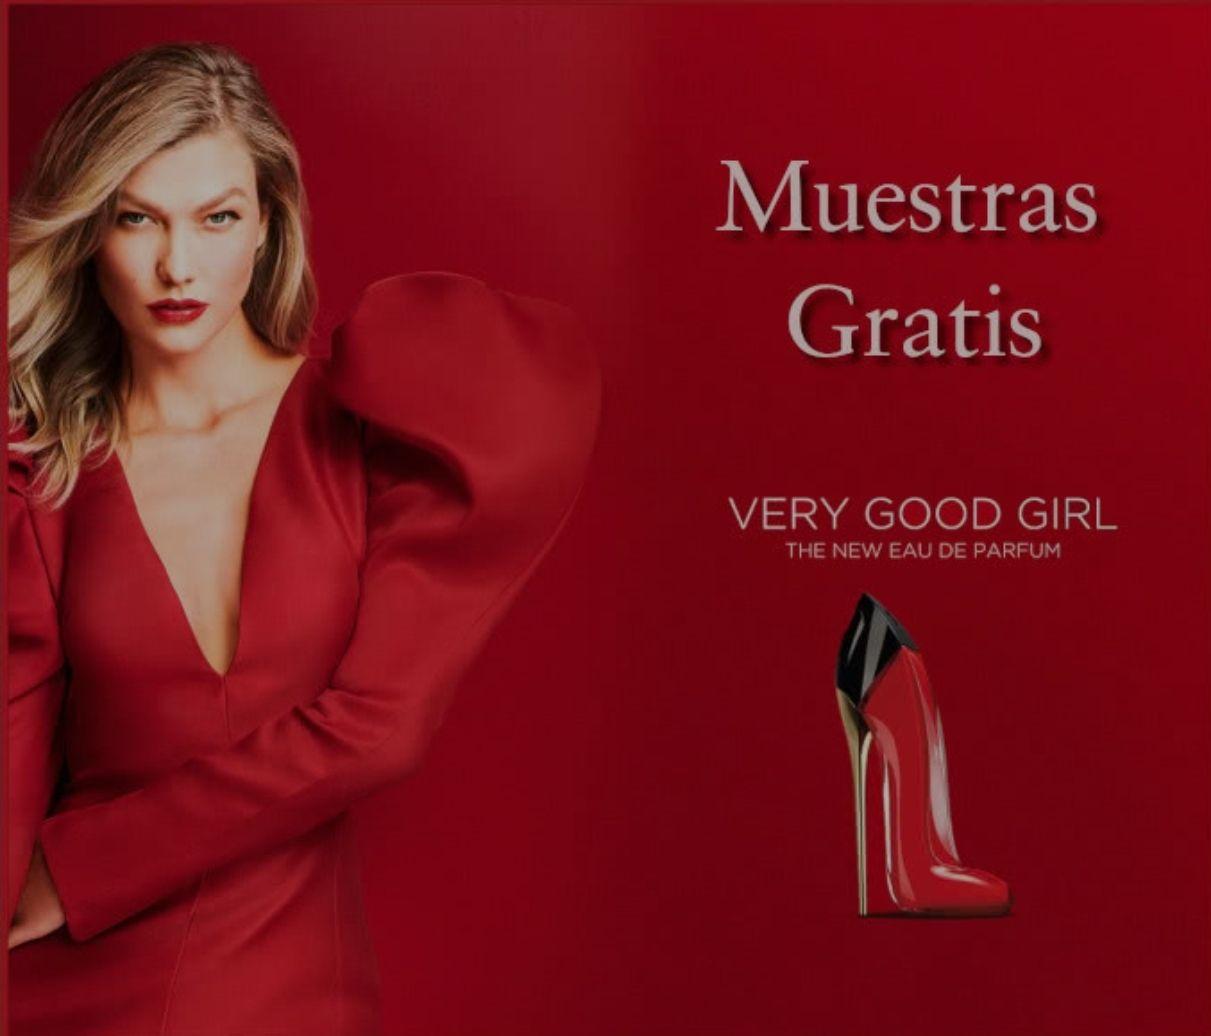 Muestras gratis perfume VERY GOOD GIRL #Carolina Herrera#